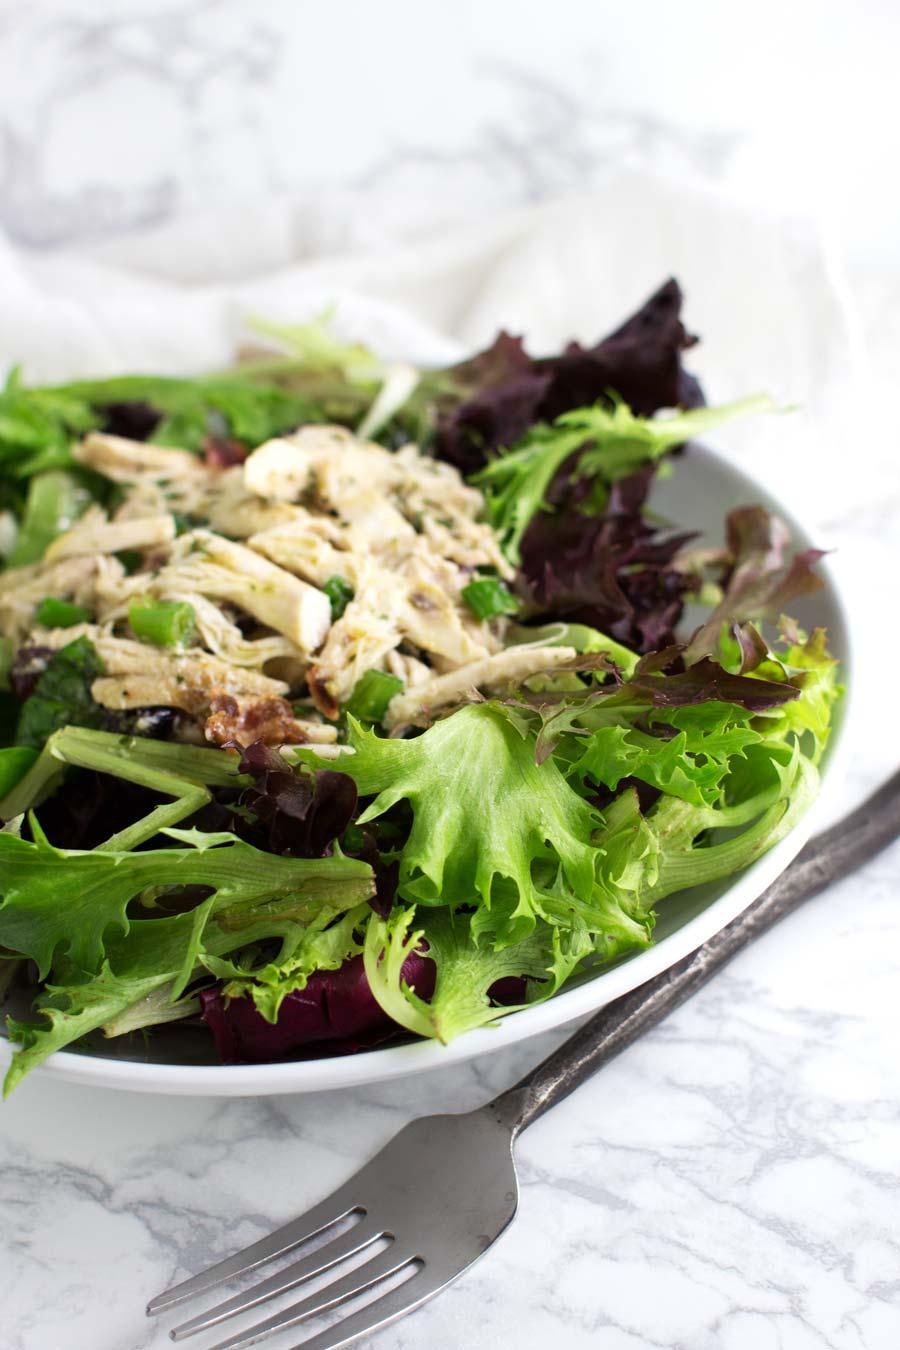 Turkey Club Salad recipe from acleanplate.com #aip #paleo #glutenfree